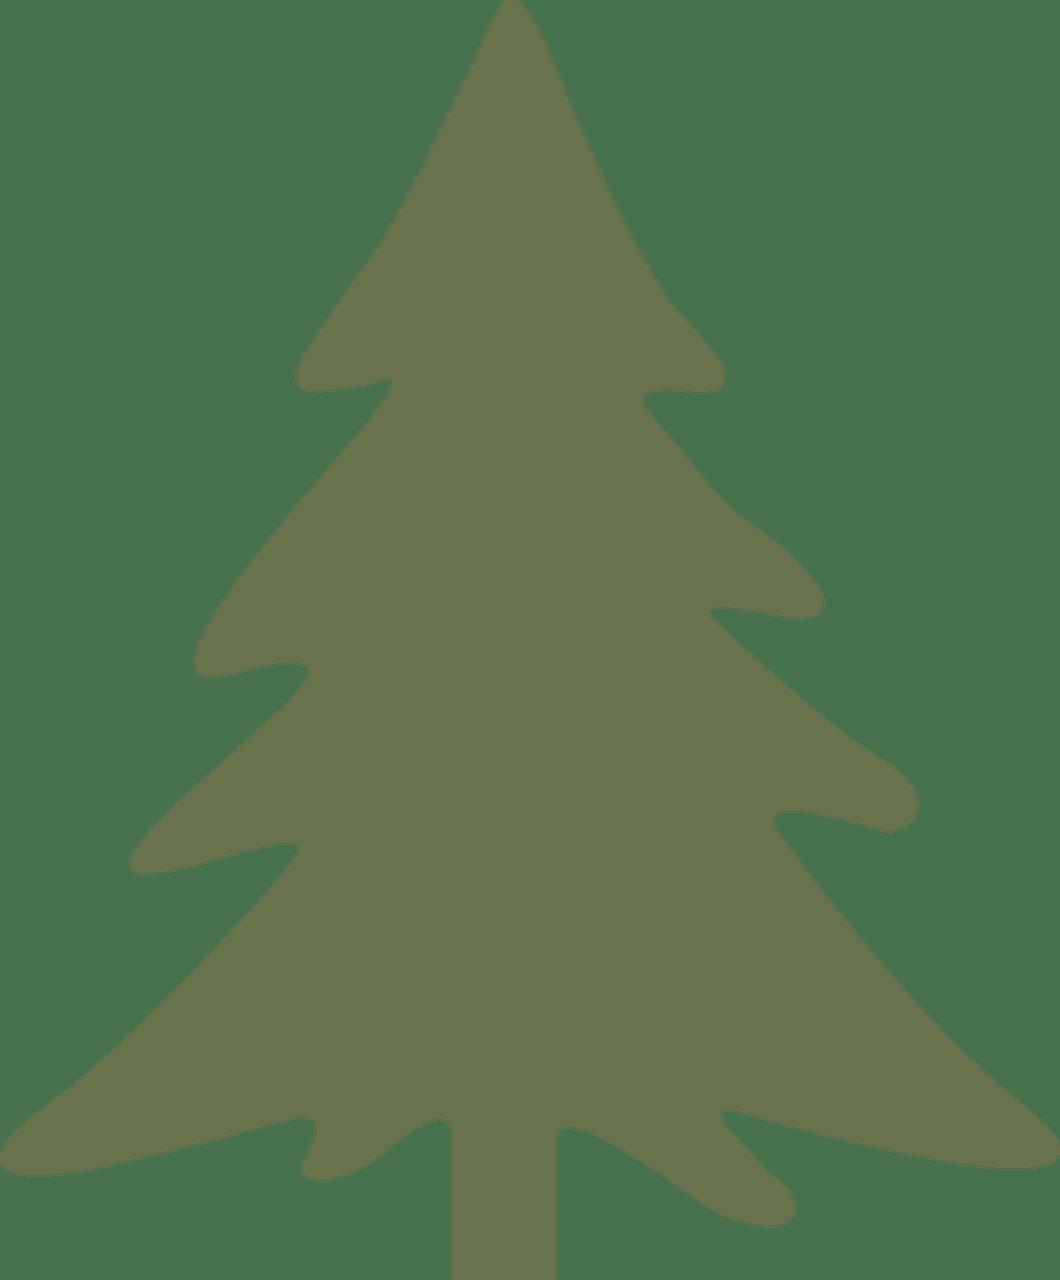 pine tree template free